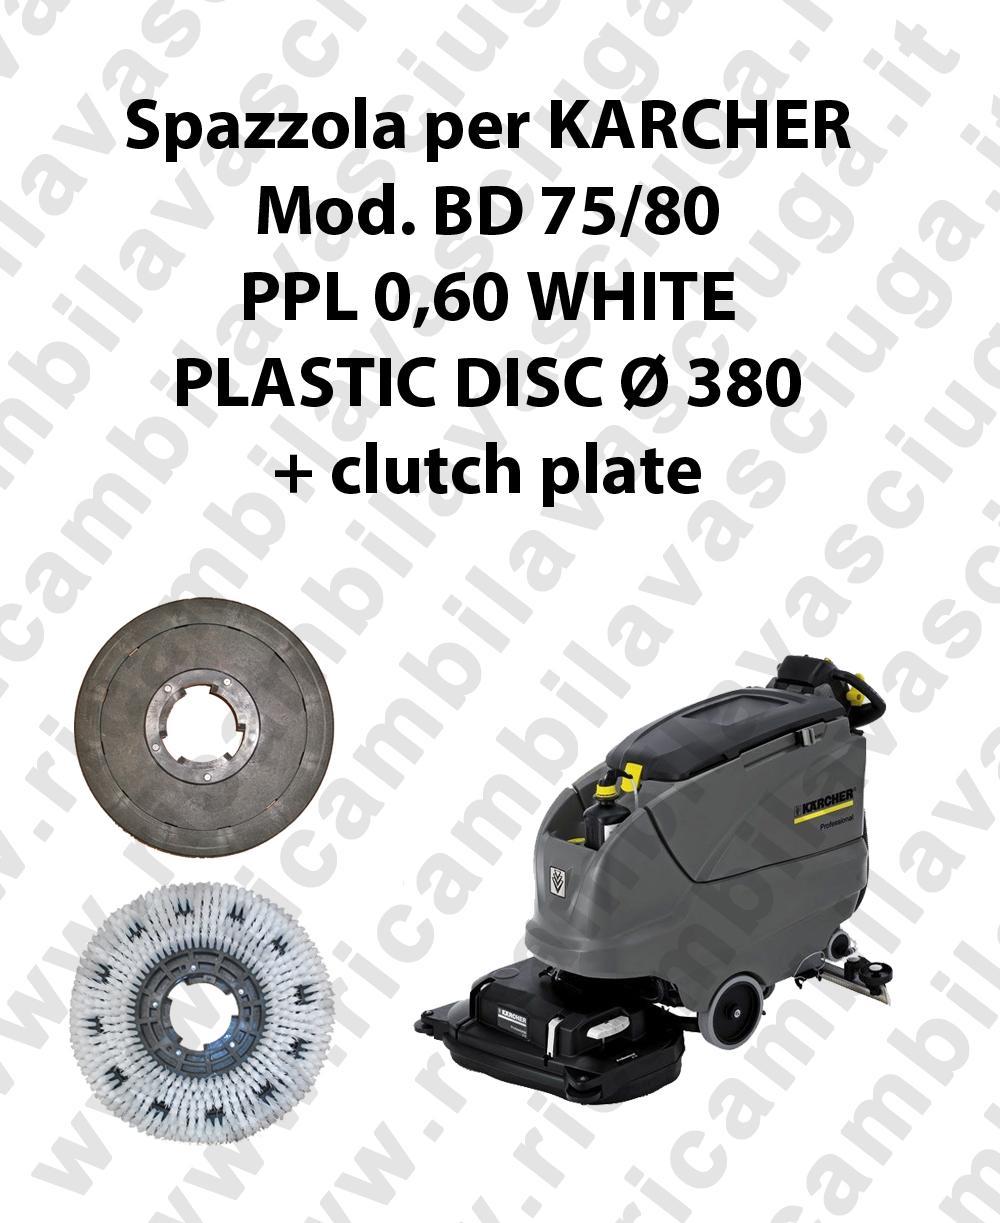 Spazzola lavare PPL 0.6 WHITE per lavapavimenti KARCHER modello BD 75/80